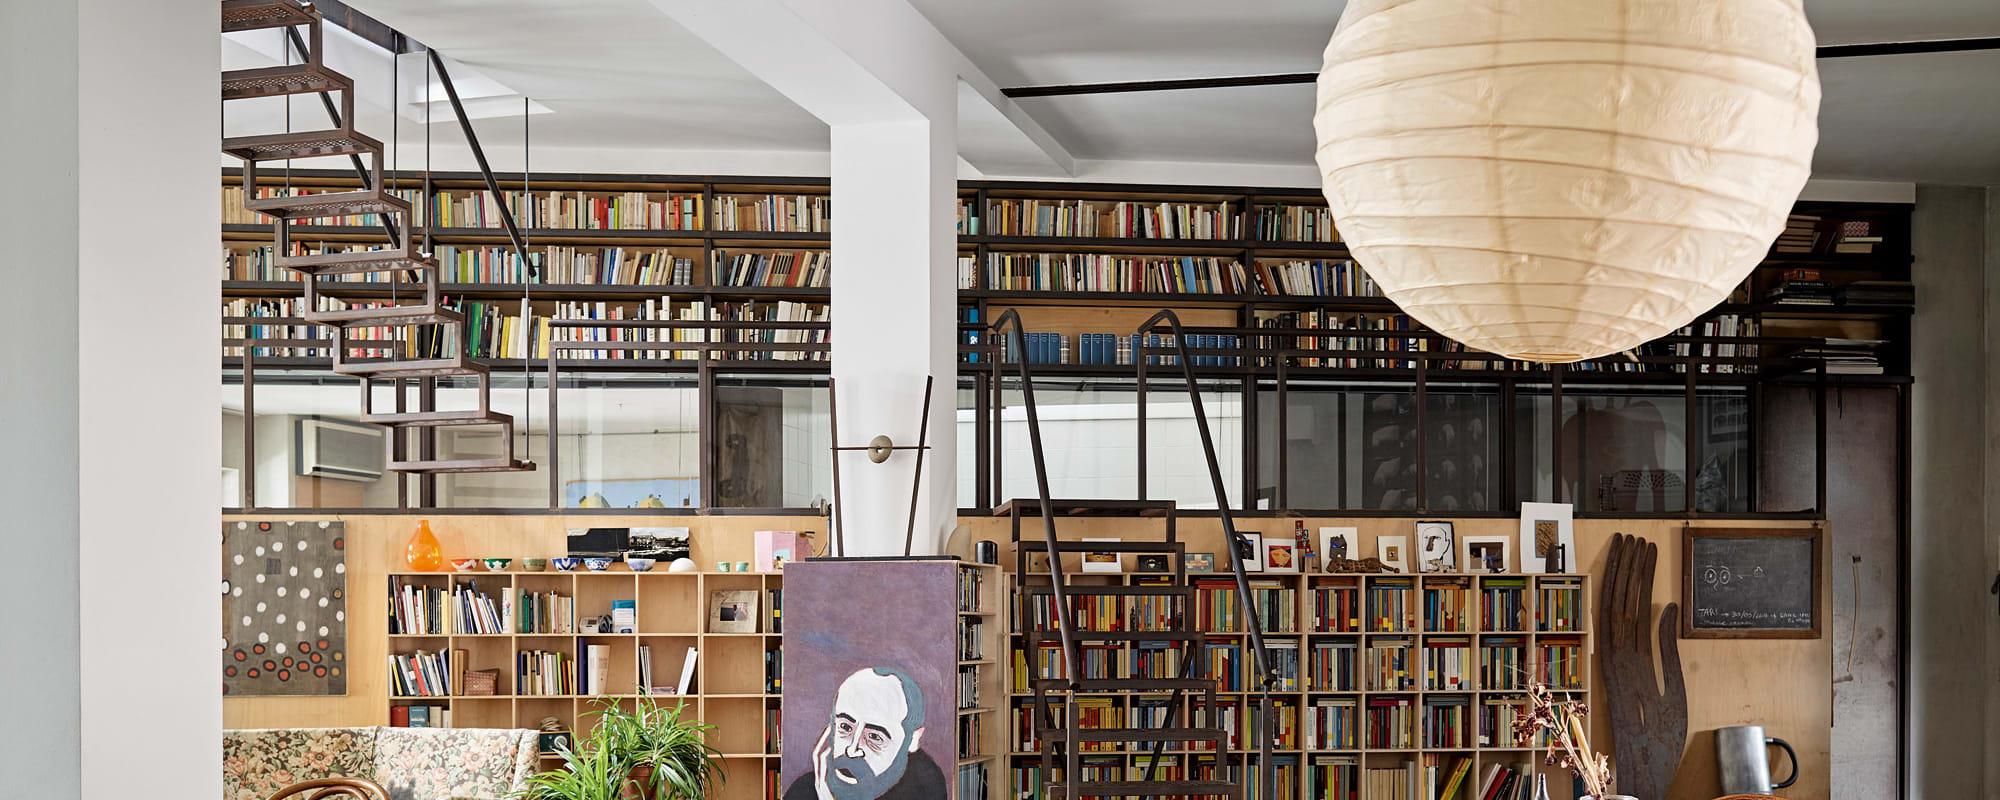 Guido Scarabottolo, Architekt, Mailand, Italien, Thonet